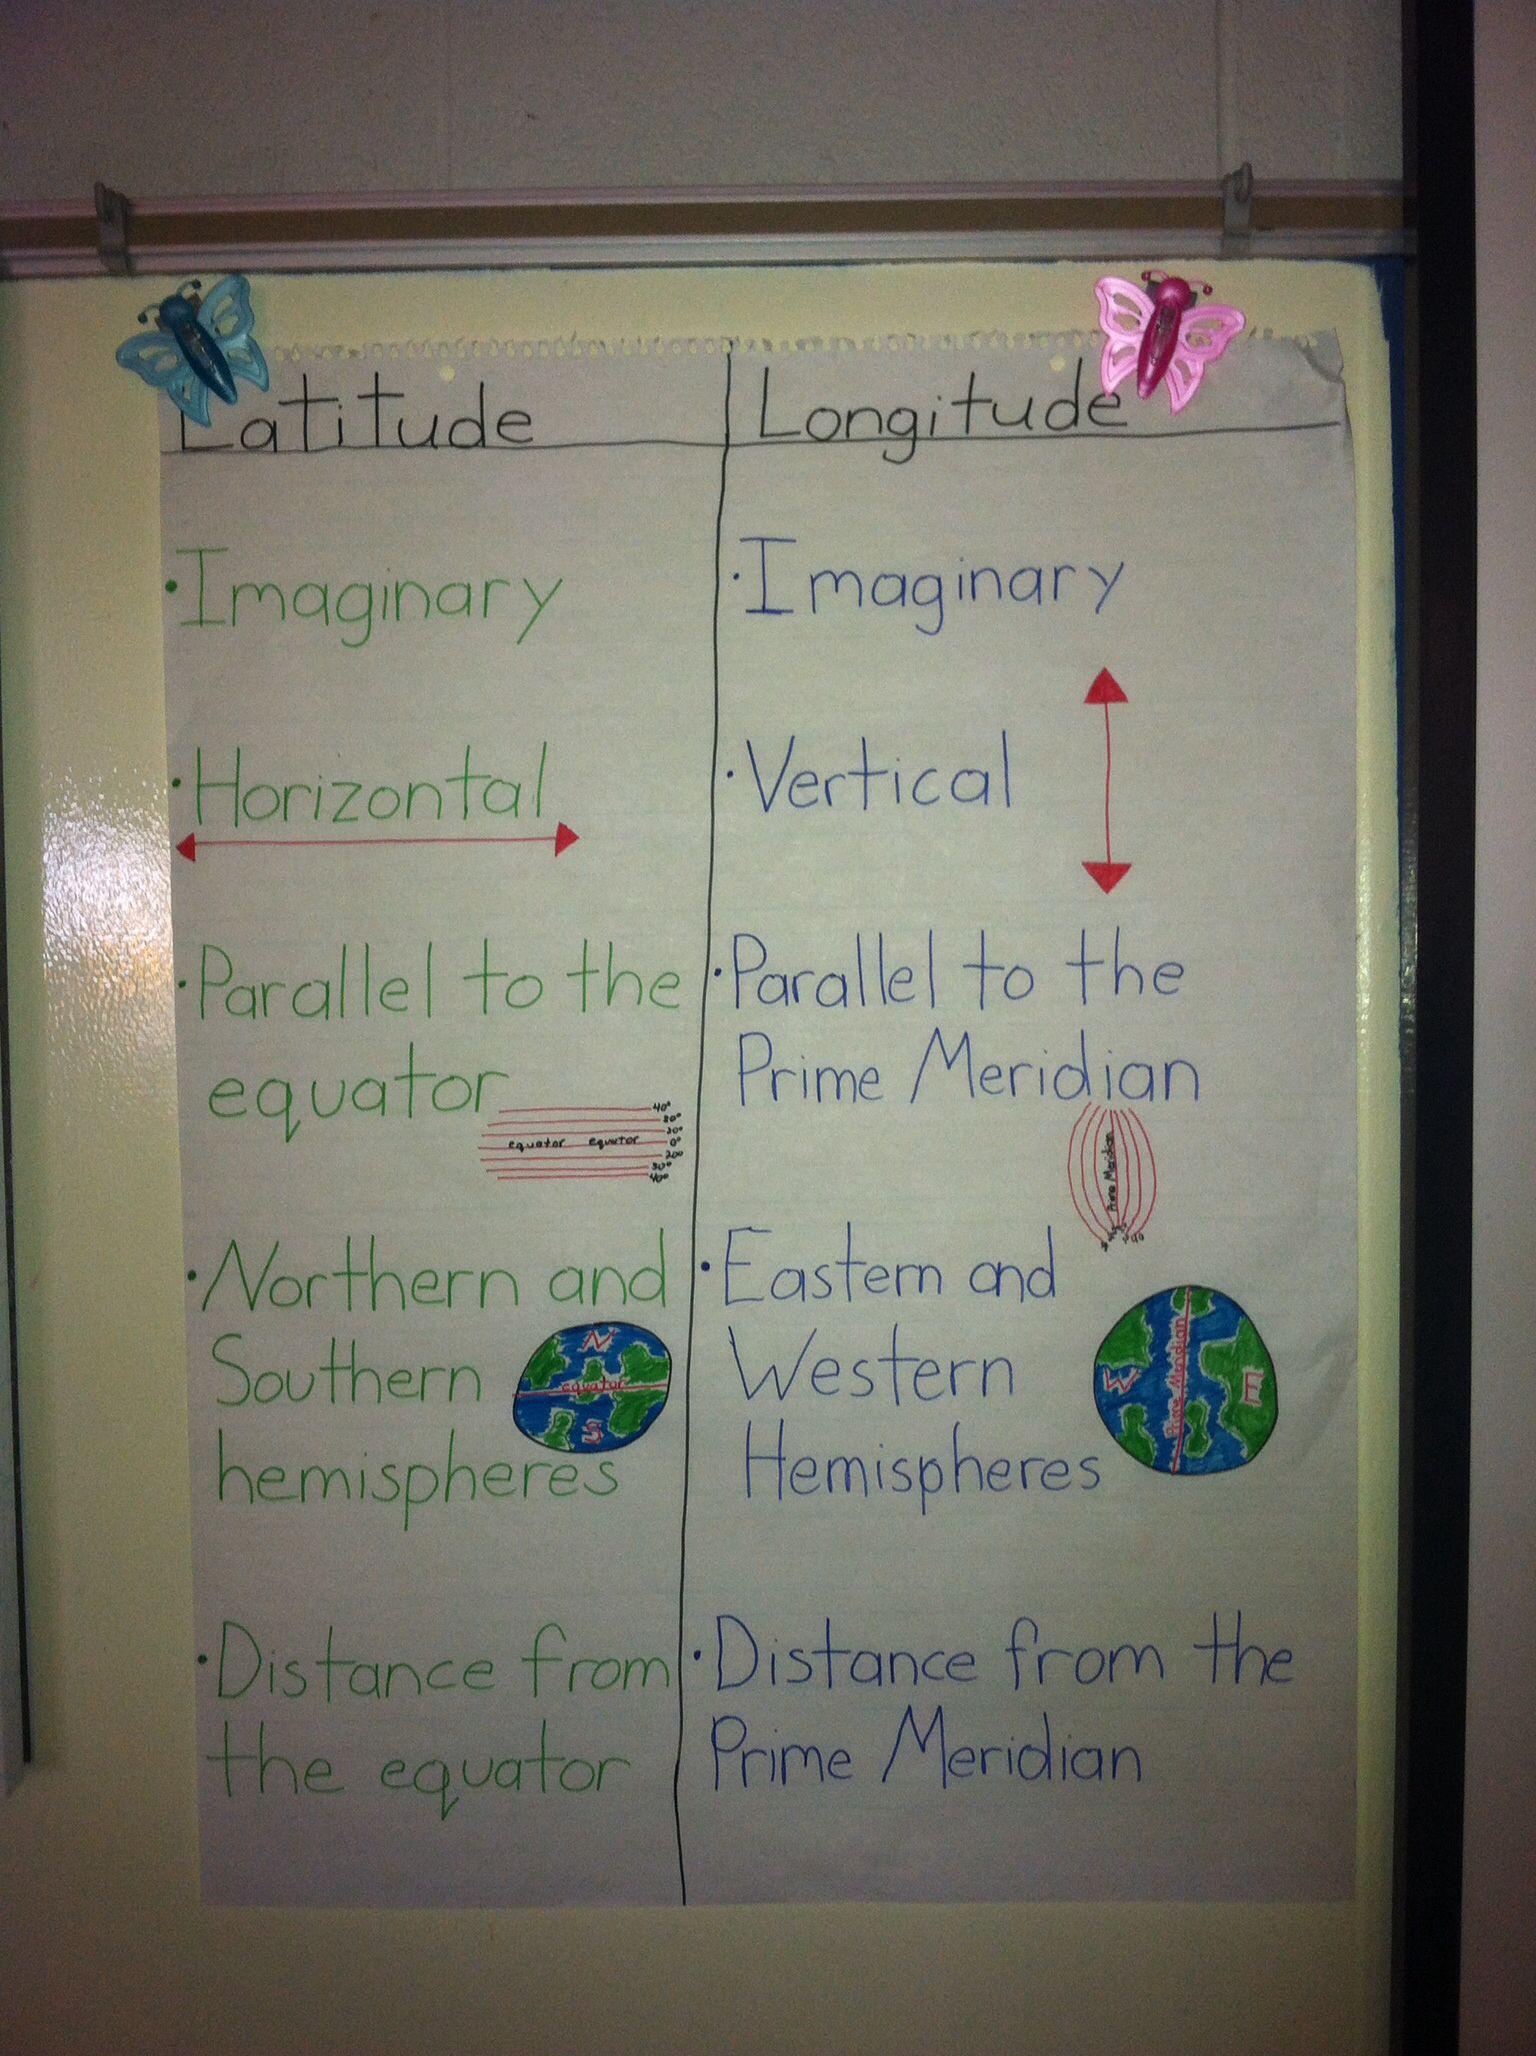 hight resolution of longitude and latitude chart